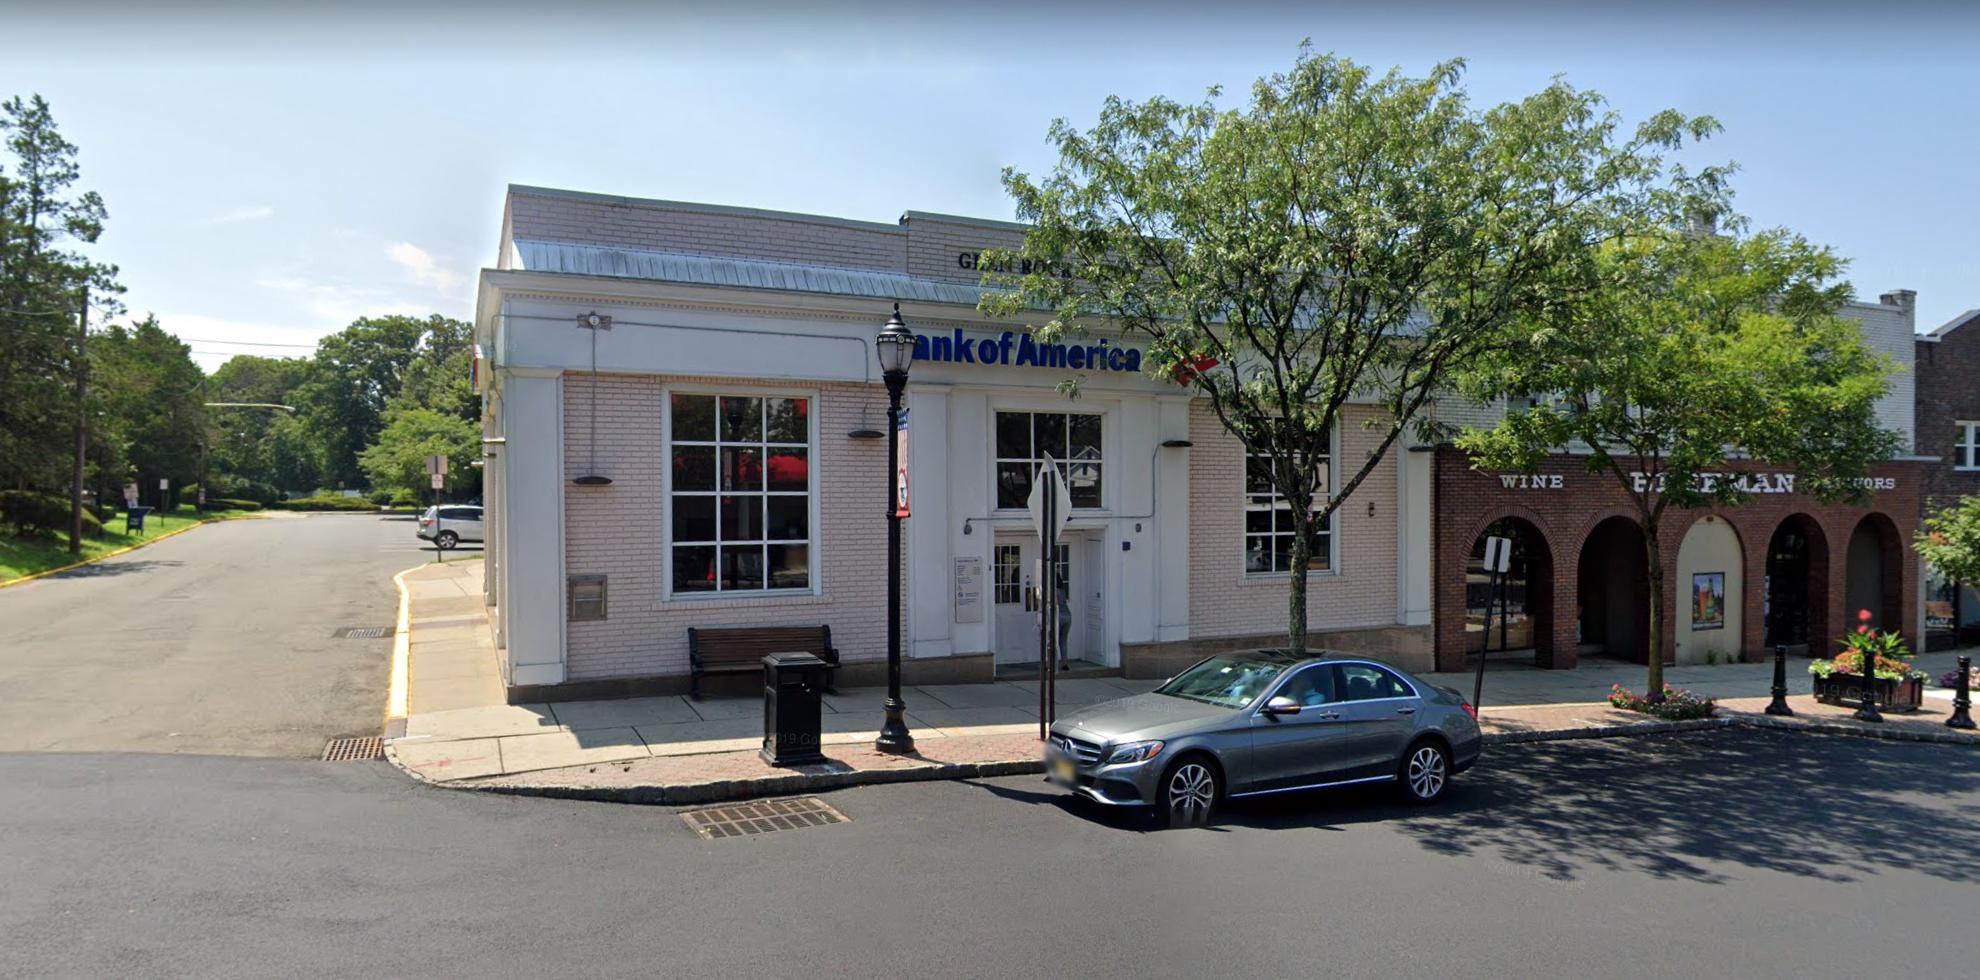 Bank of America financial center with drive-thru ATM | 252 Rock Rd, Glen Rock, NJ 07452